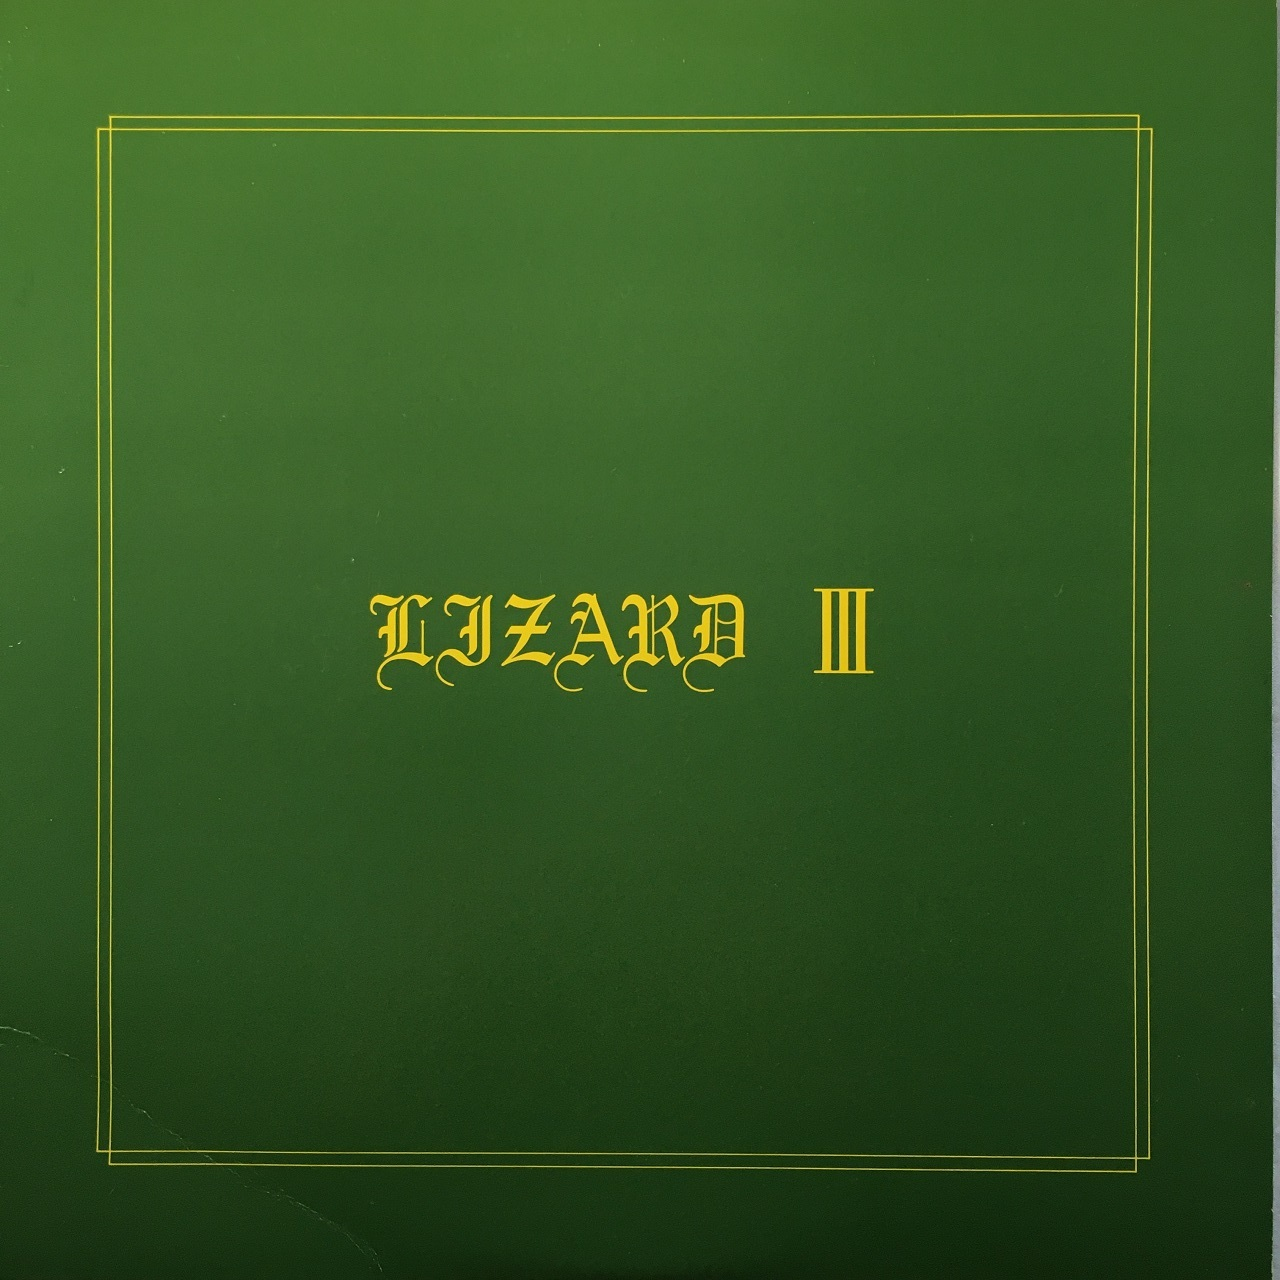 【12inch・国内盤】リザード / Lizard Ⅲ